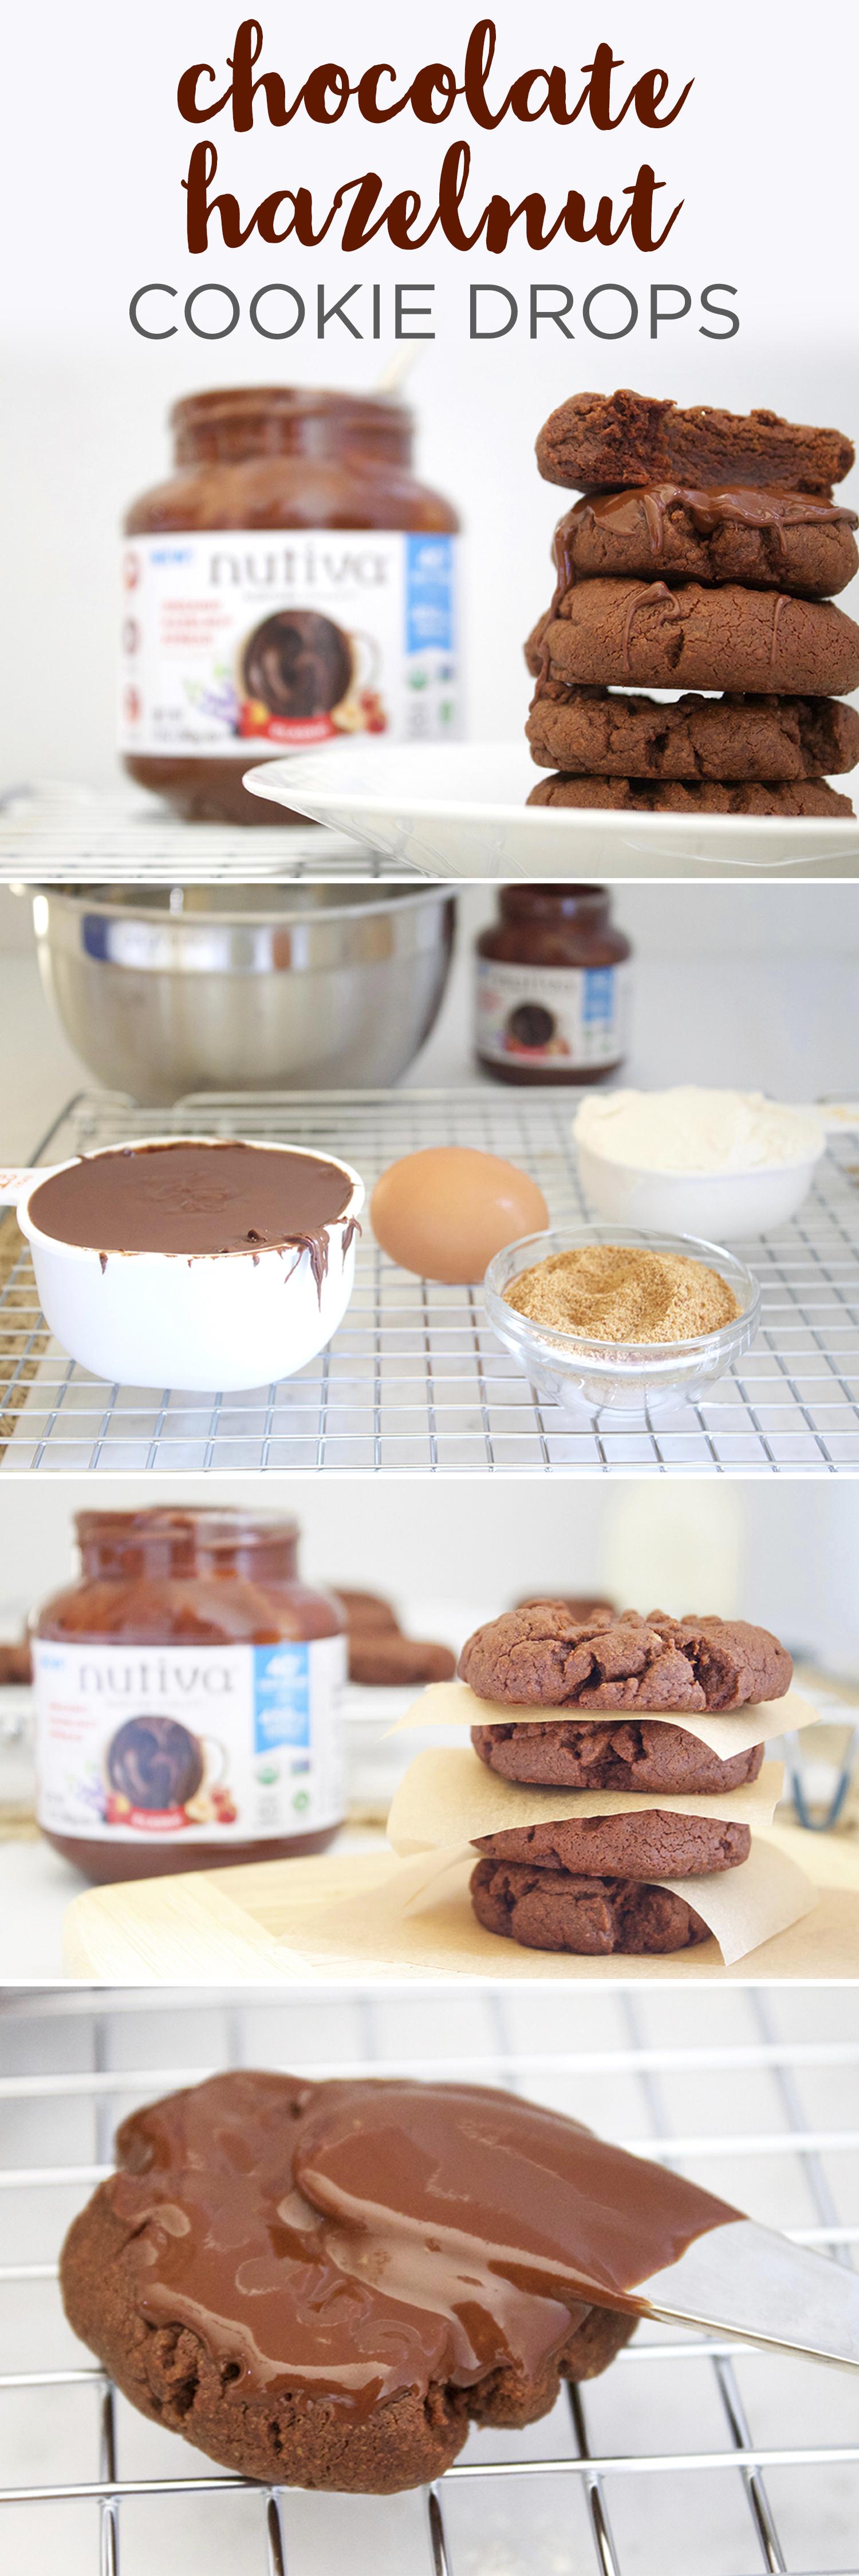 Chocolate Hazelnut Cookie Drops kitchen.nutiva.com